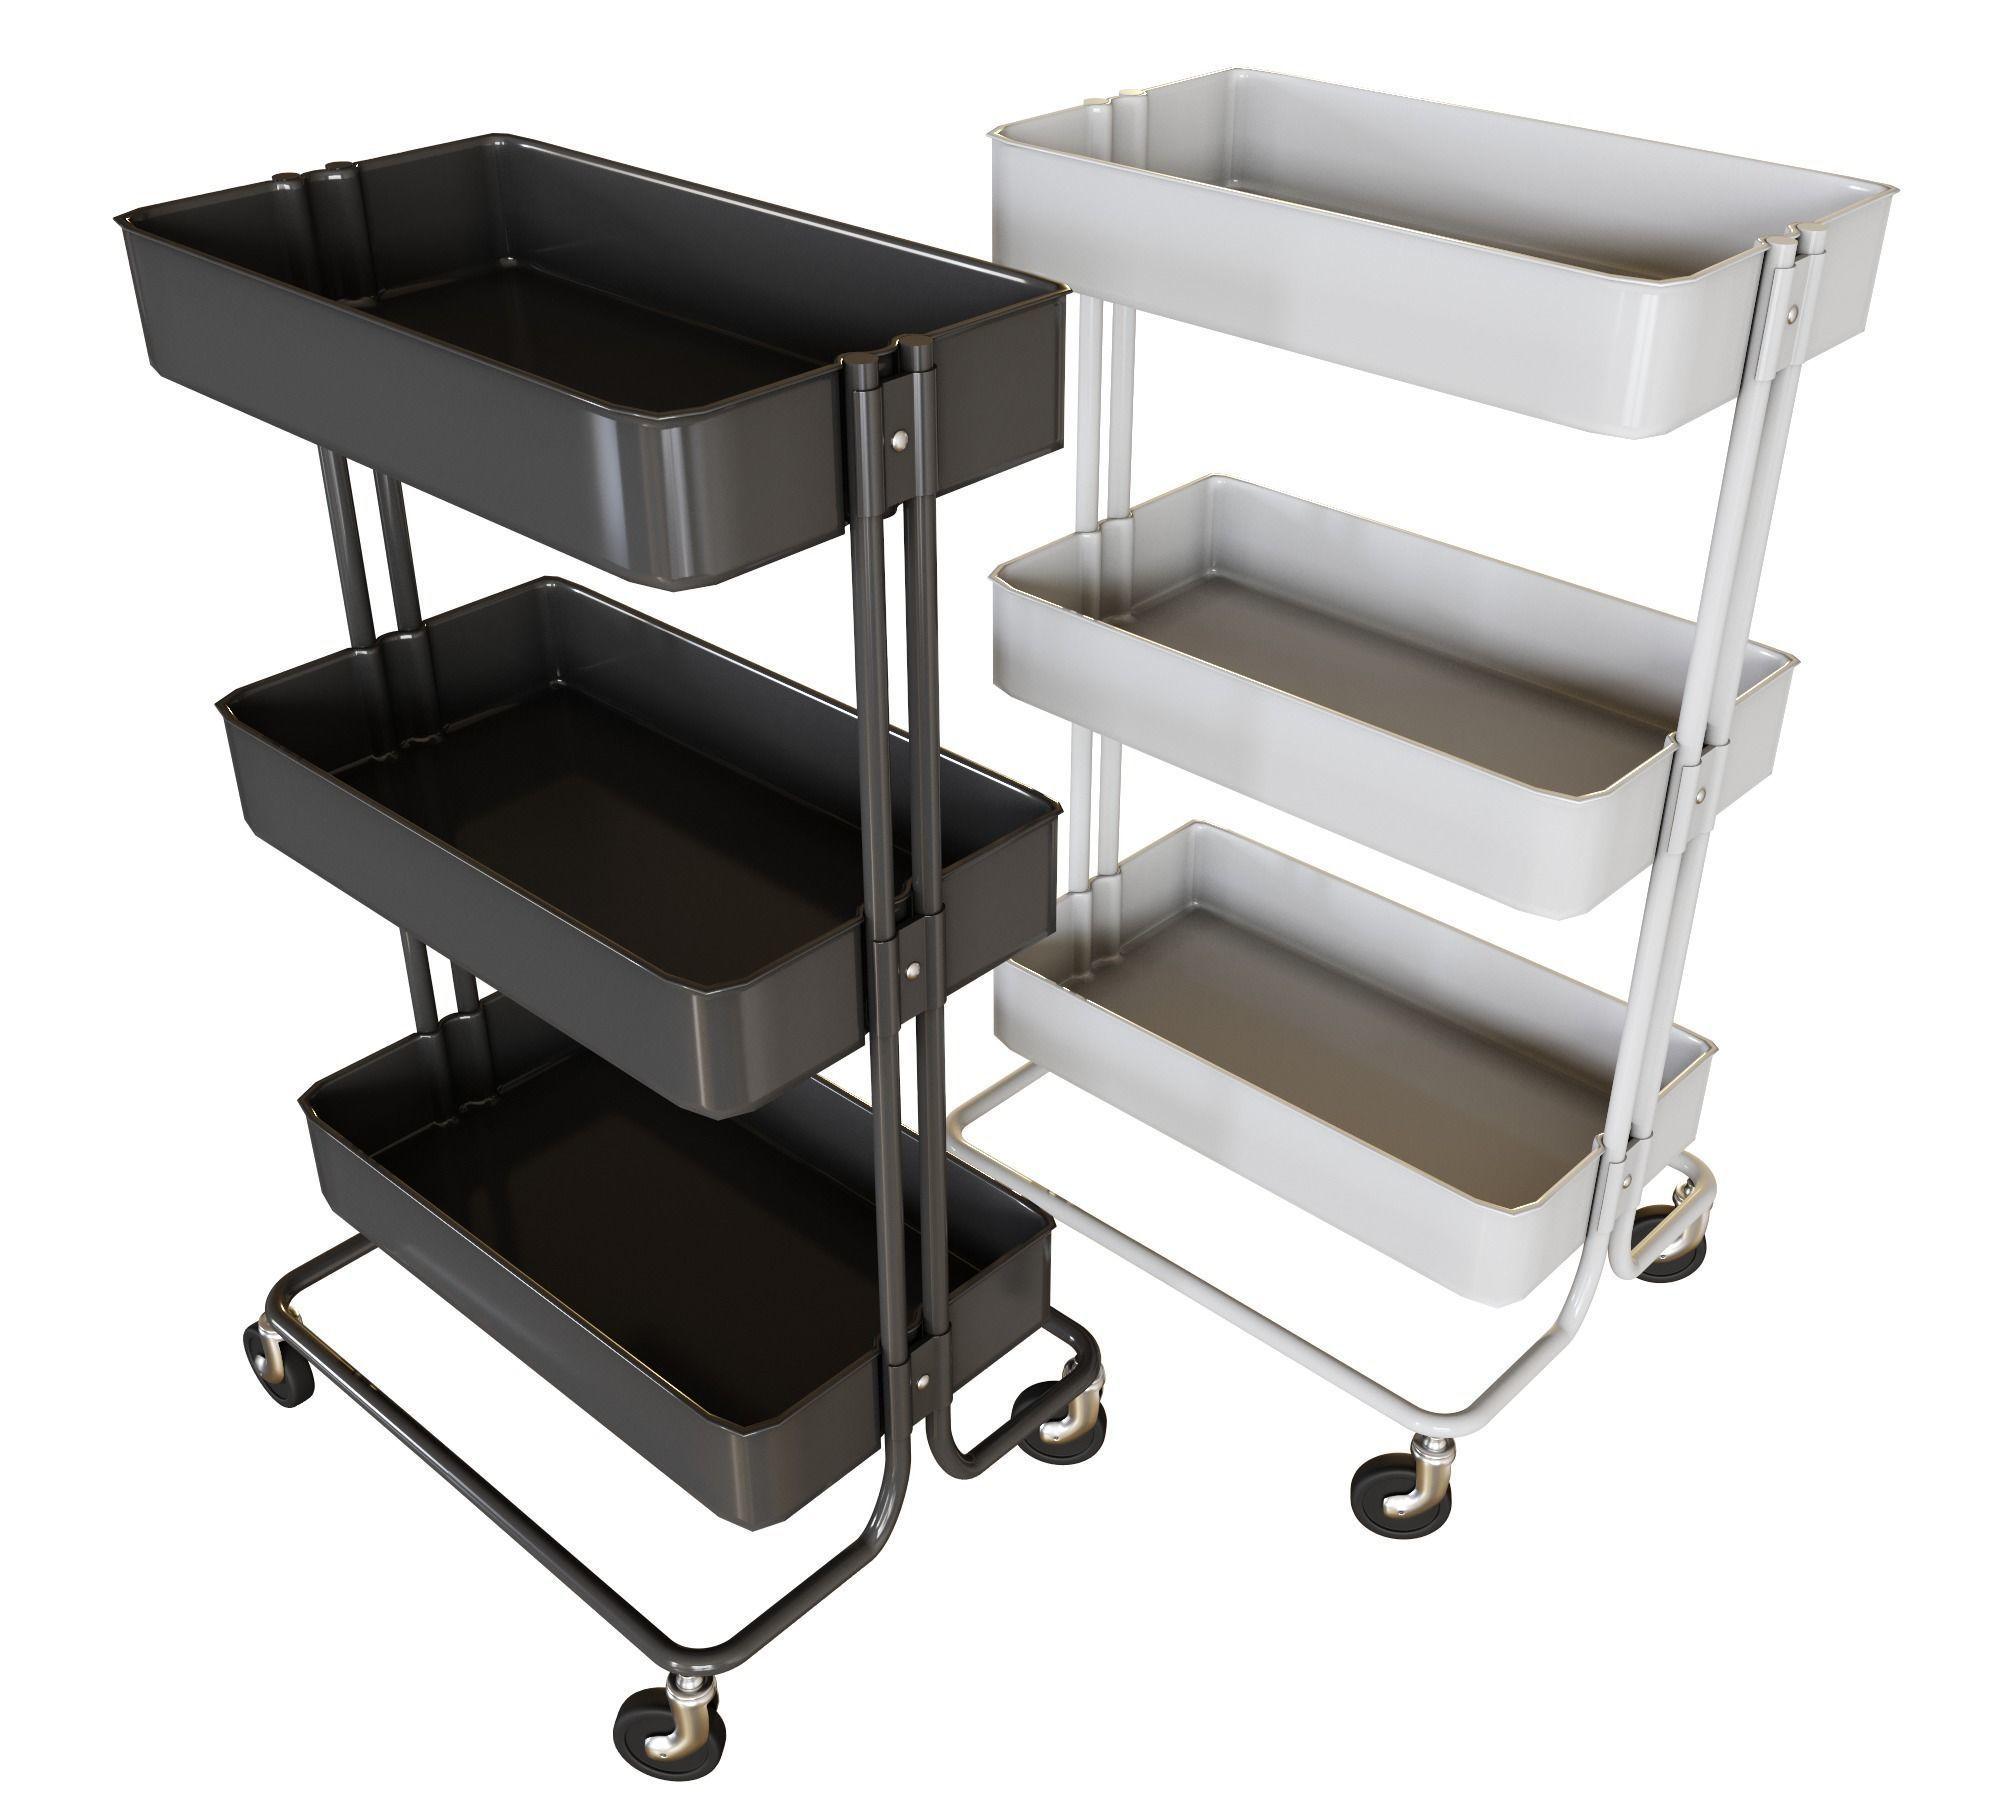 Ikea Cart On Wheels For Kitchen 3d Model